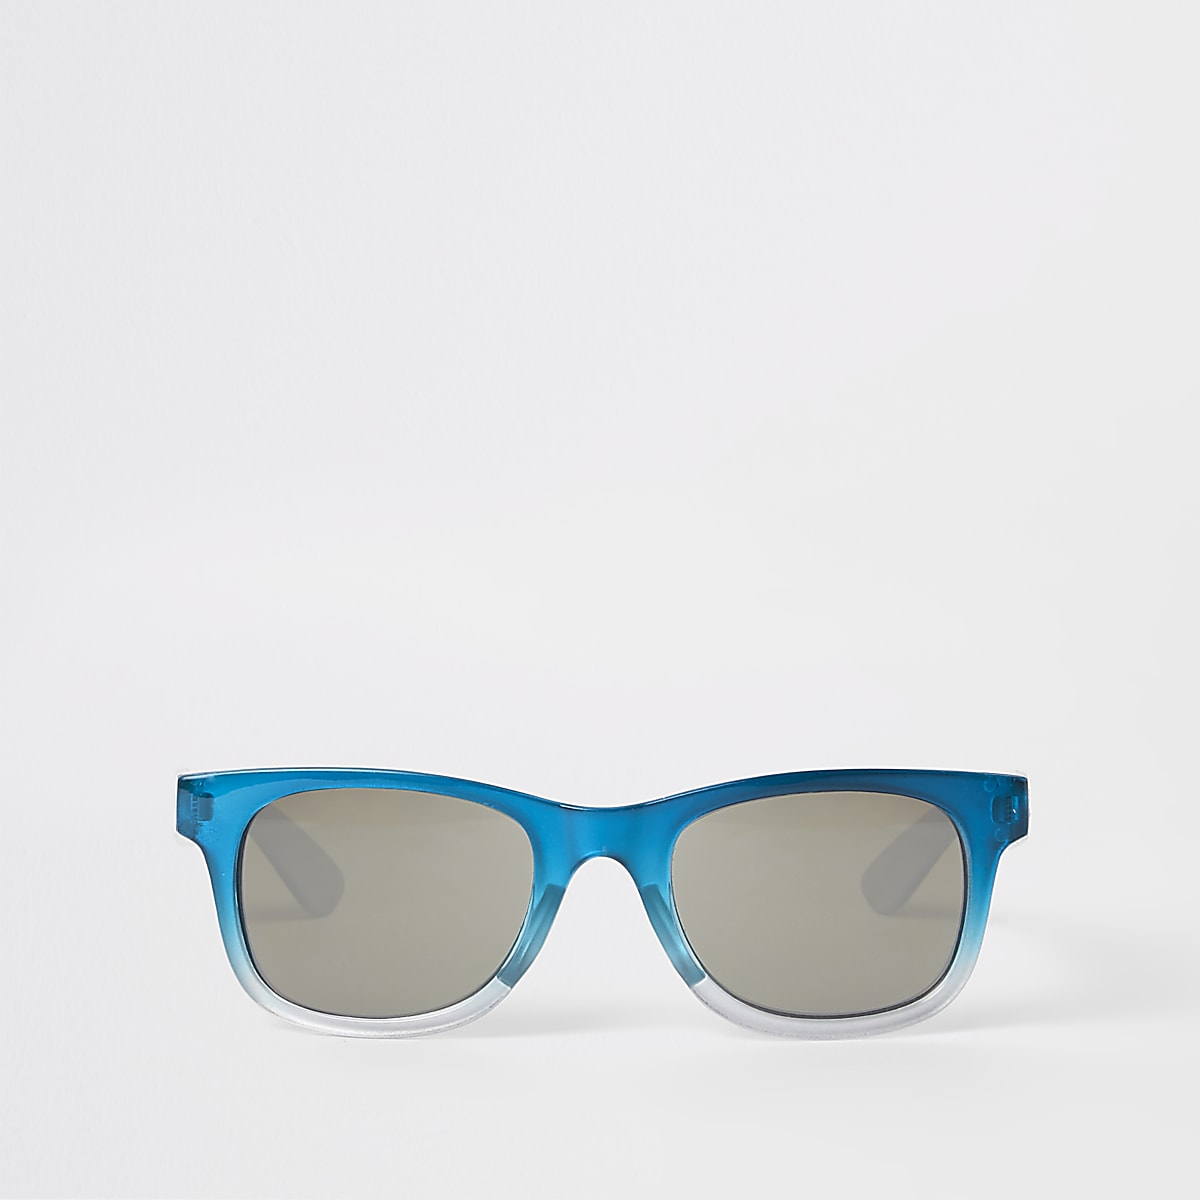 Boys blue ombre retro sunglasses